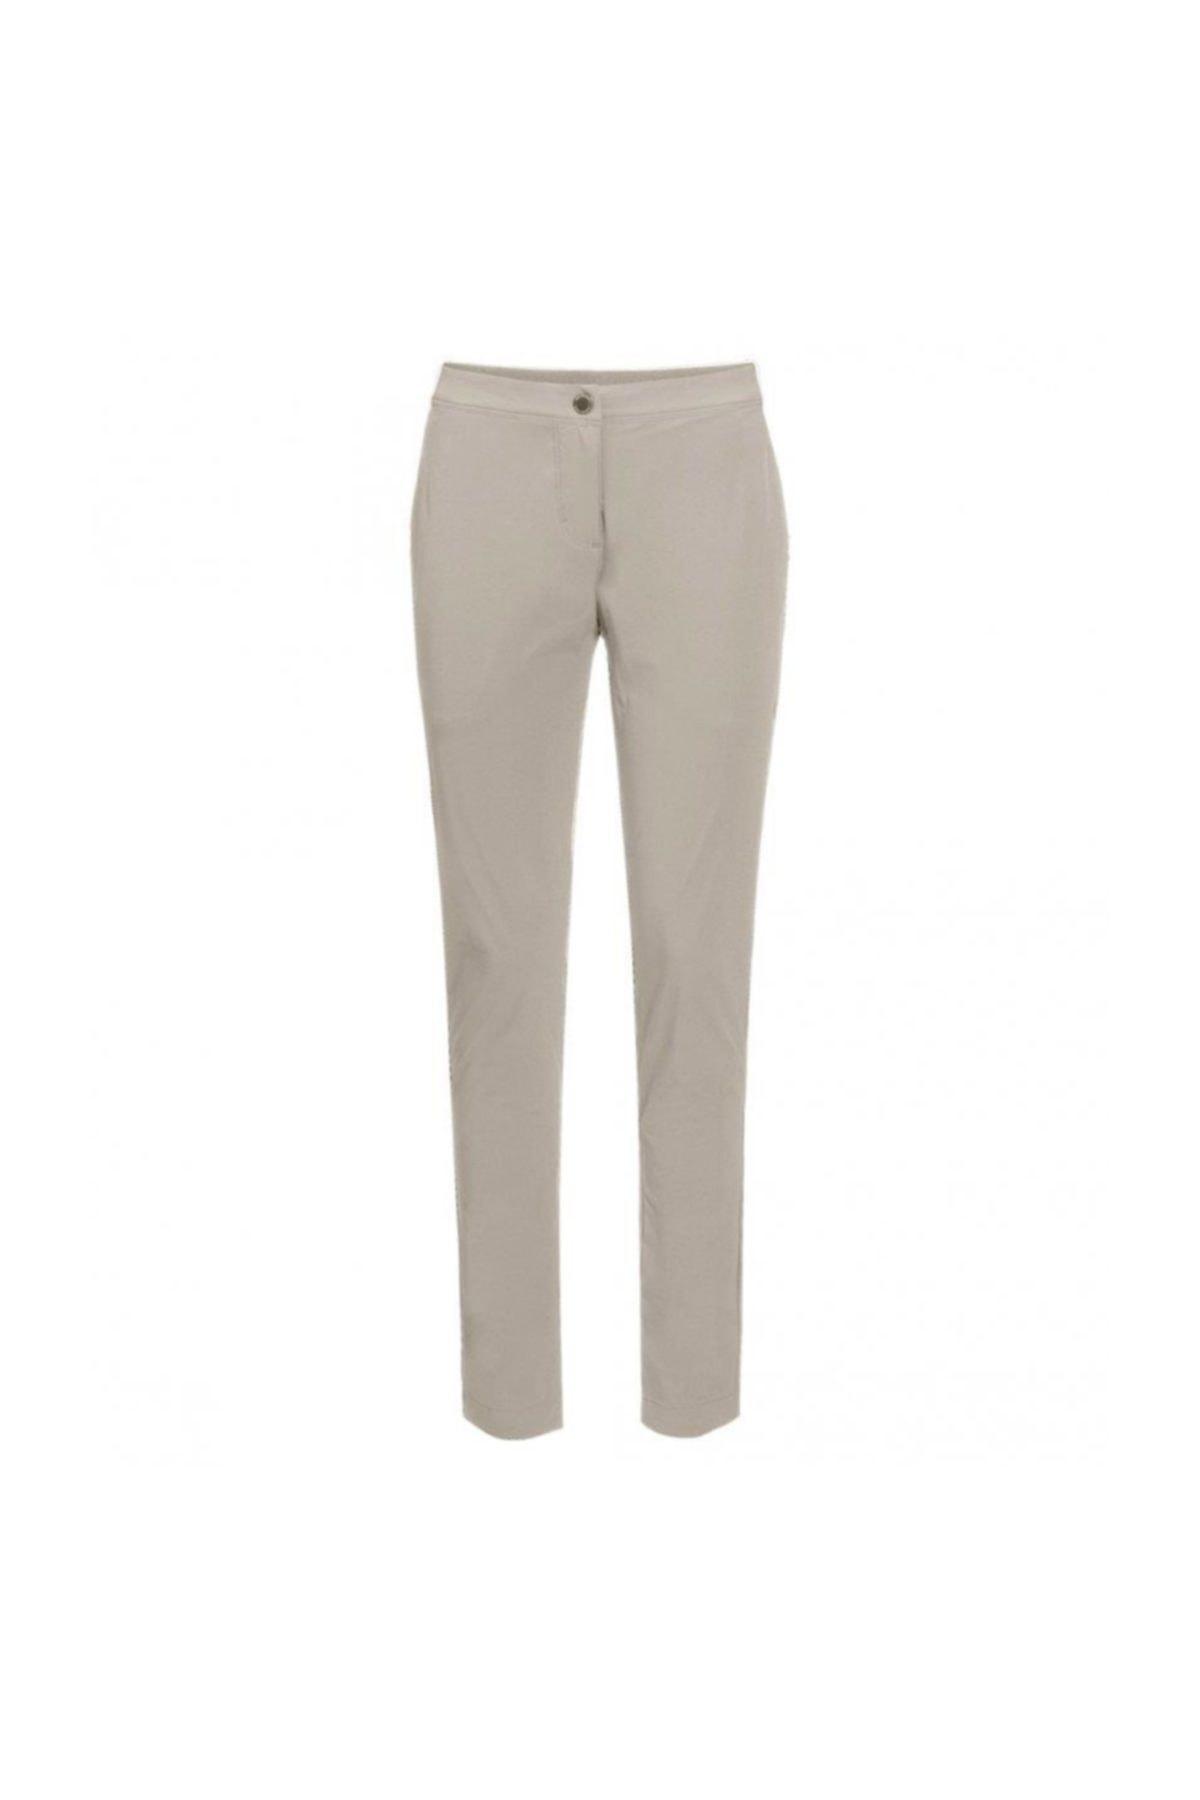 Jack Wolfskin JWP Pant Kadın Pantolon - 1505651-6260 1